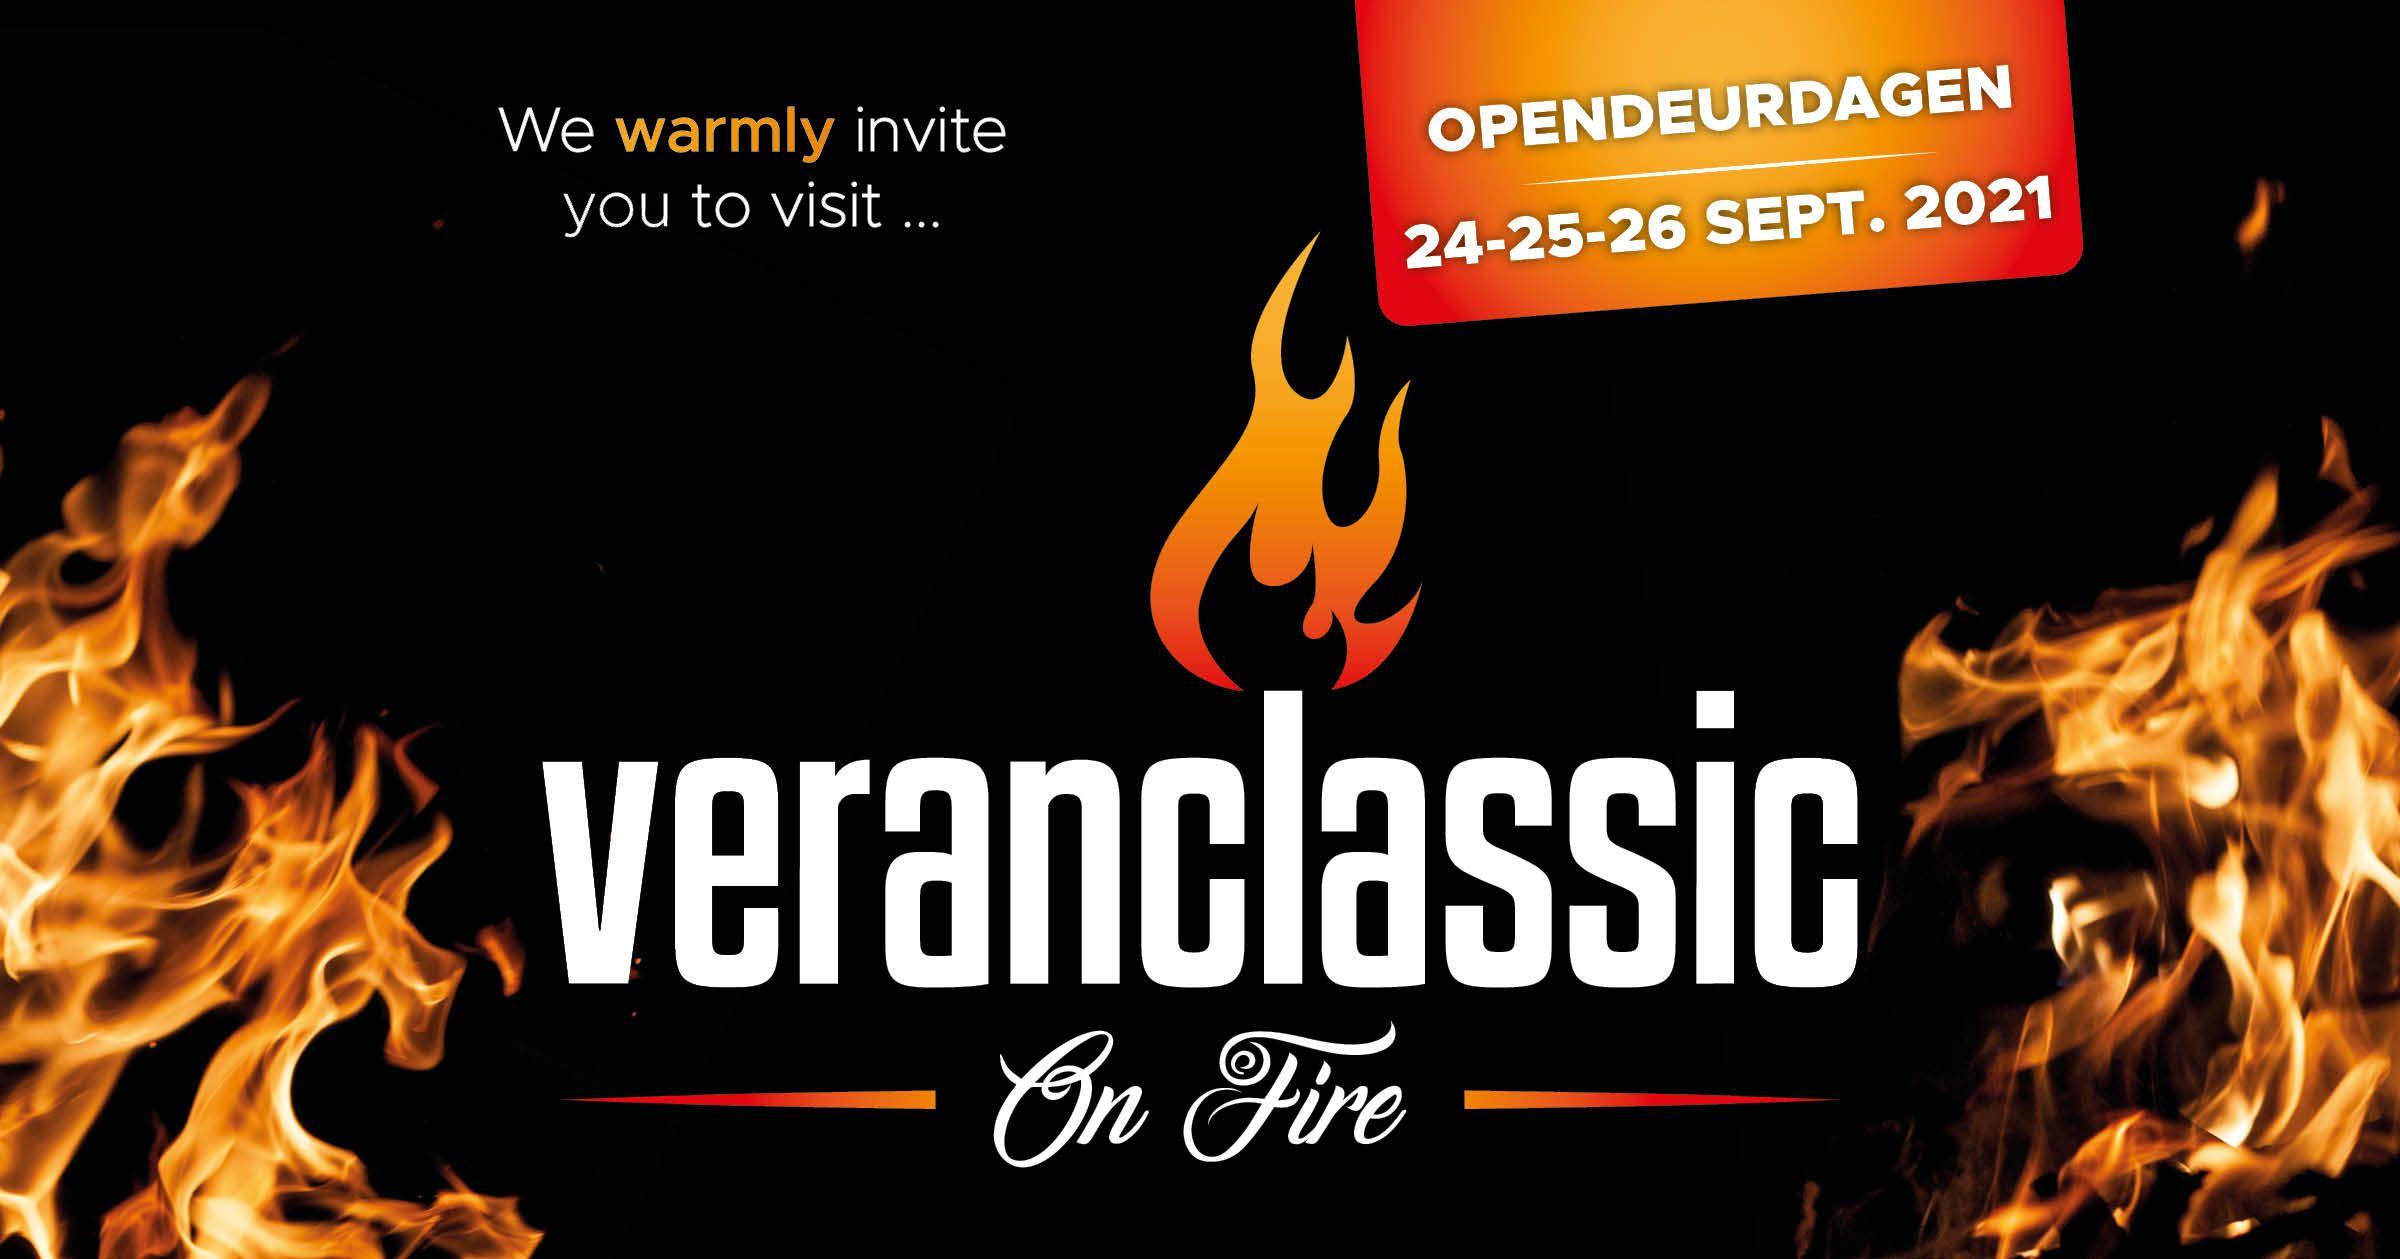 Veranclassic on Fire Vurige Opendeurdagen op 24, 25 en 26 september